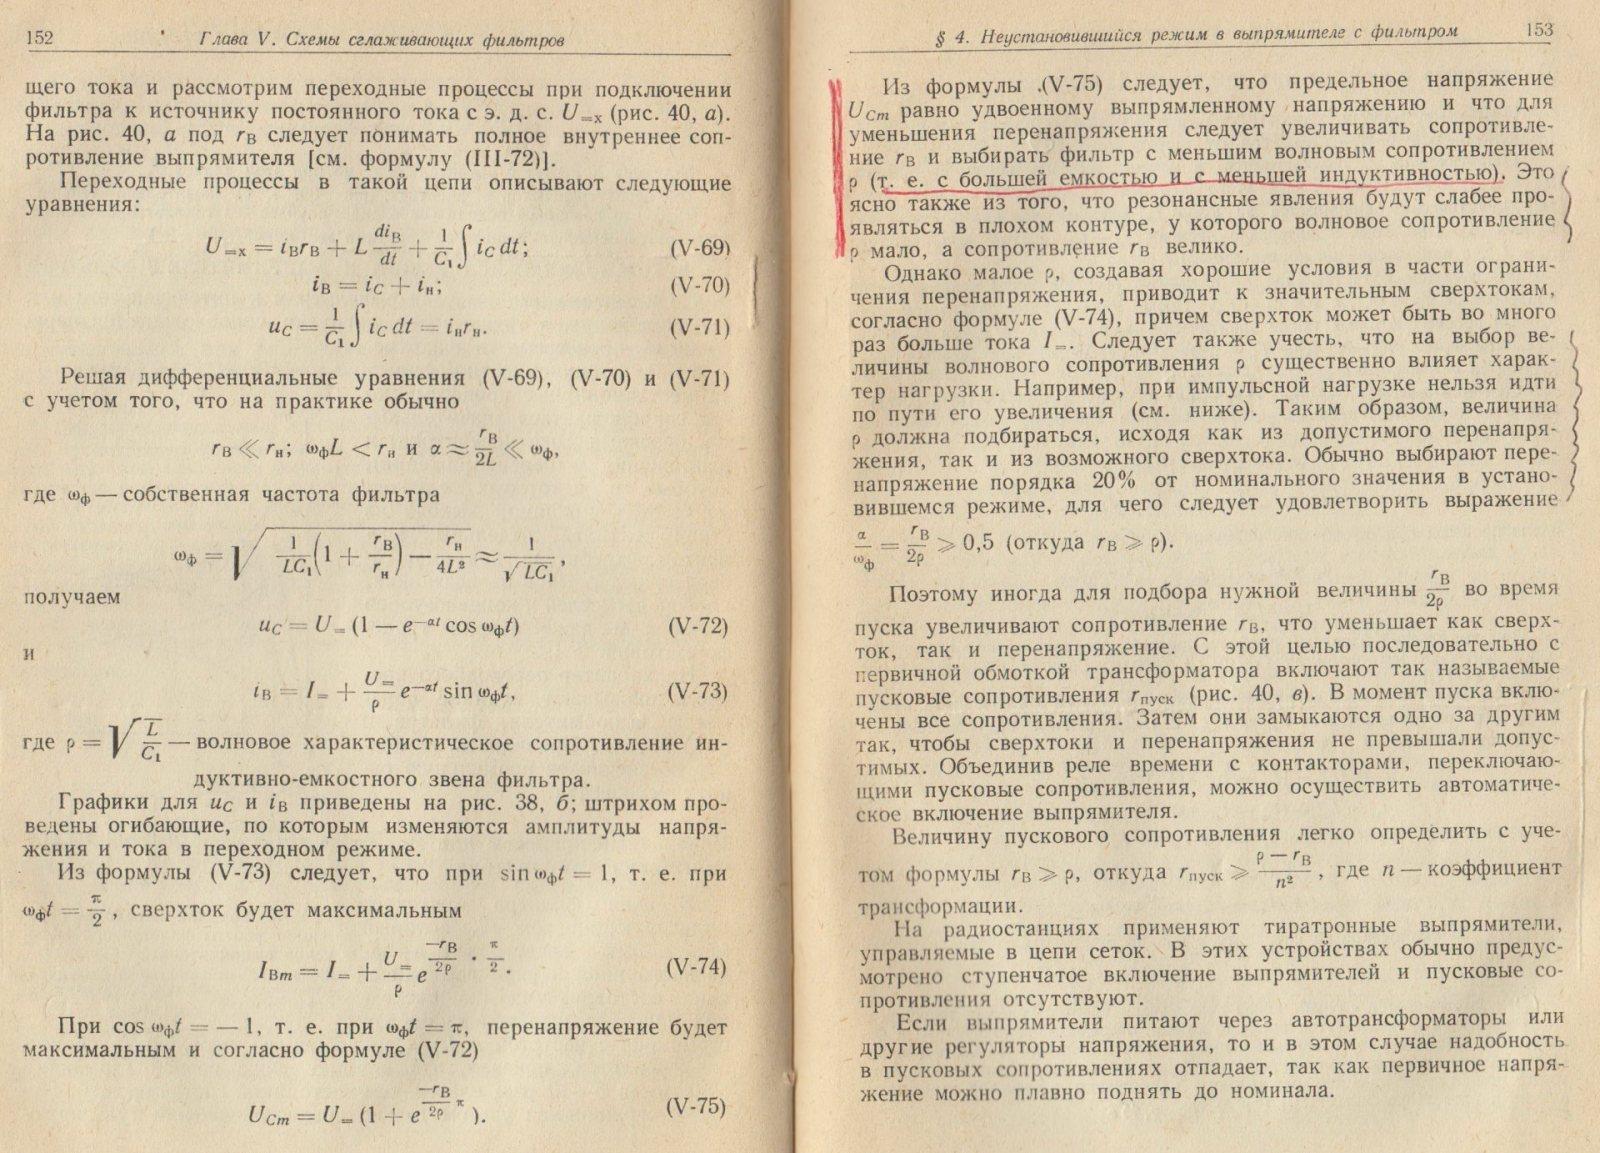 Векслер и Тетельбаум 002.jpg